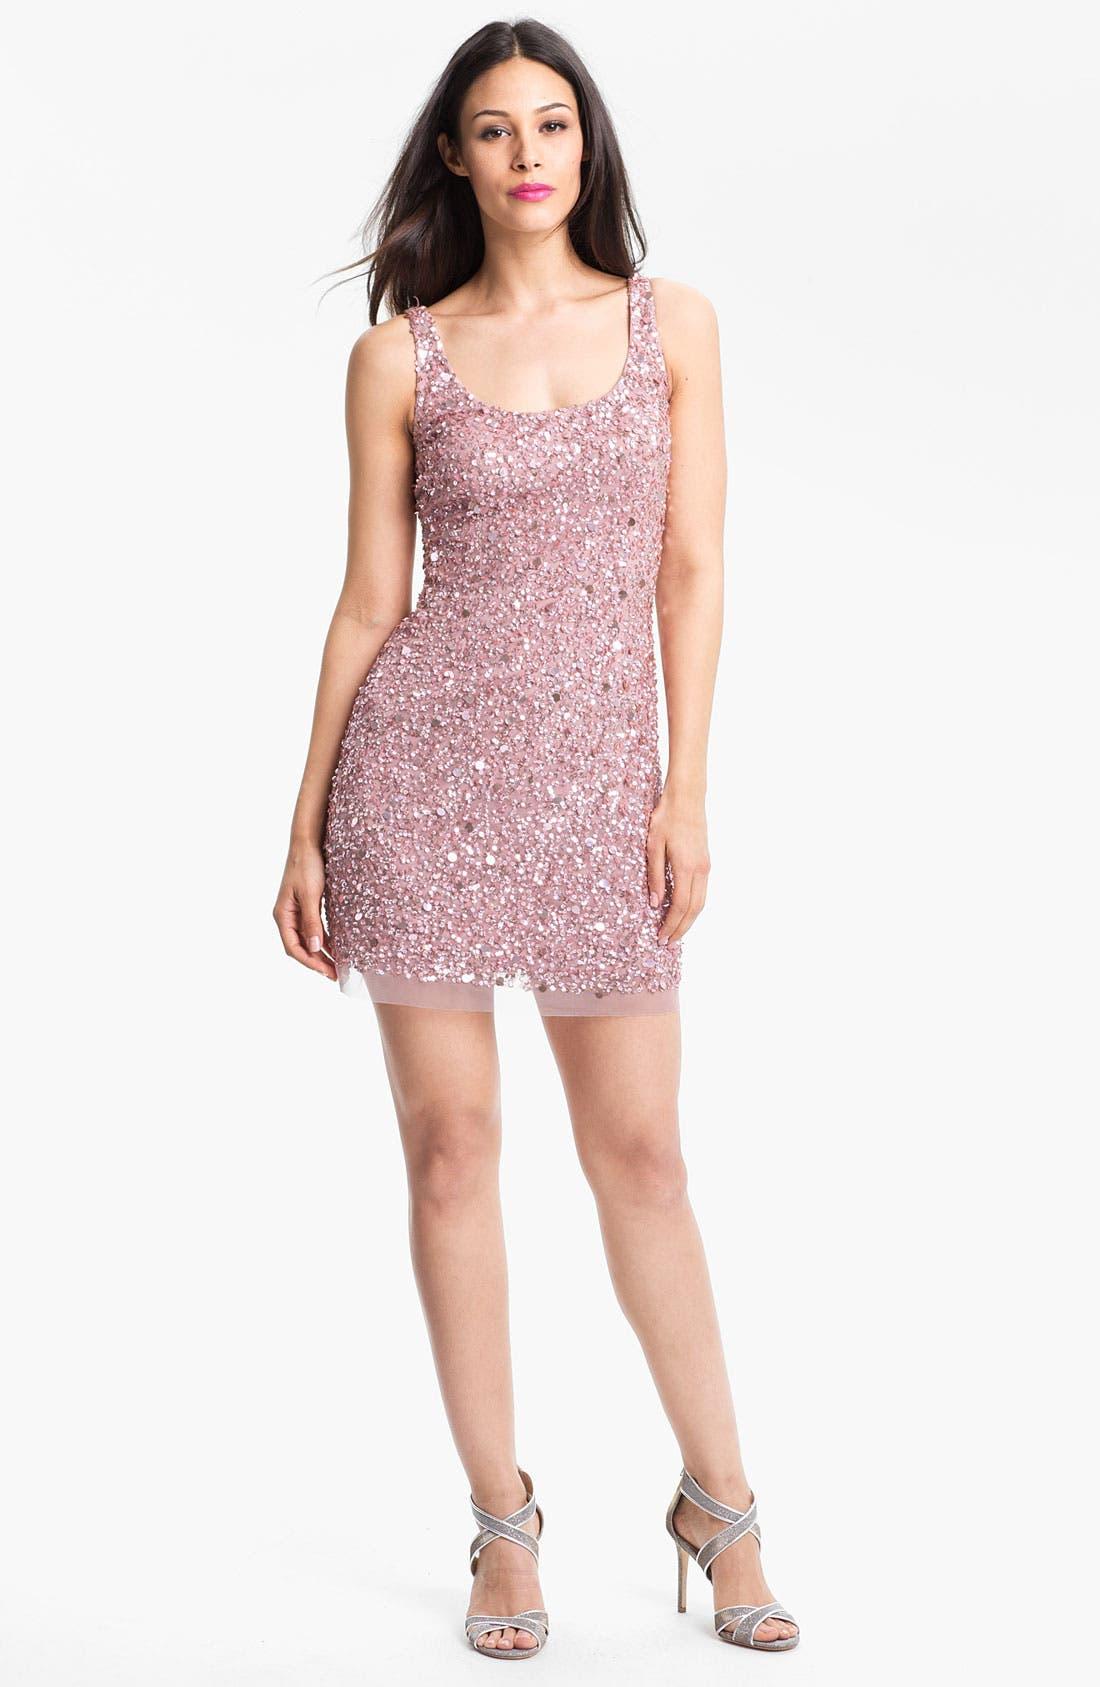 Alternate Image 1 Selected - Adrianna Papell Sequin Mesh Minidress